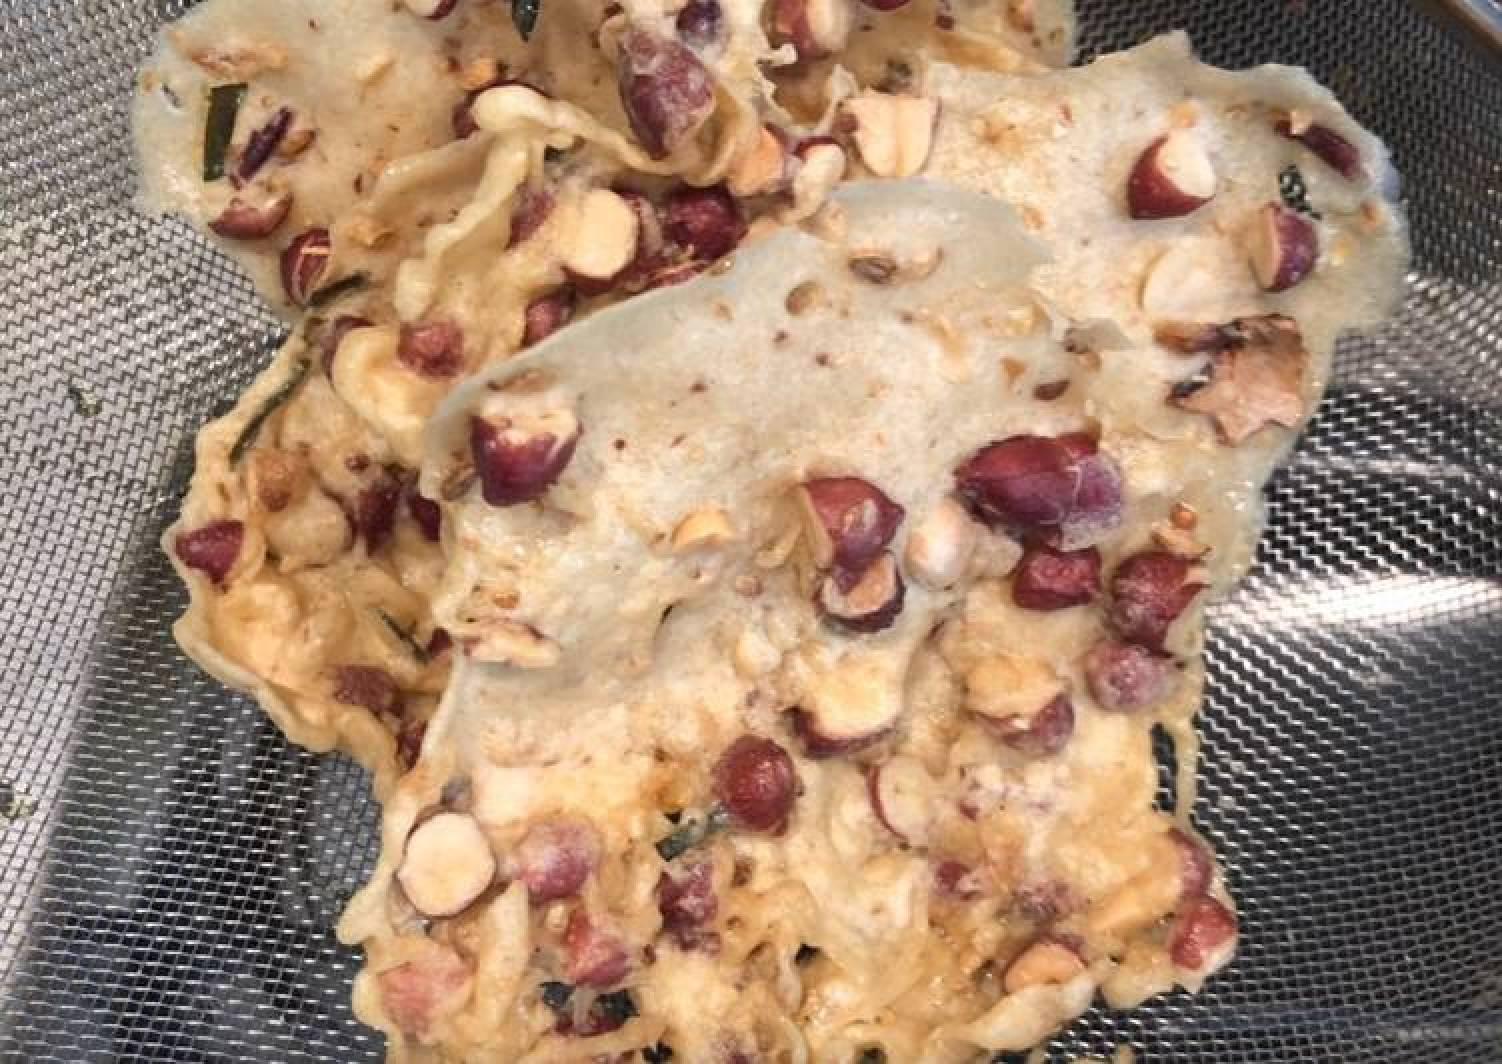 Rempeyek Kacang - Indonesian Peanut Cracker